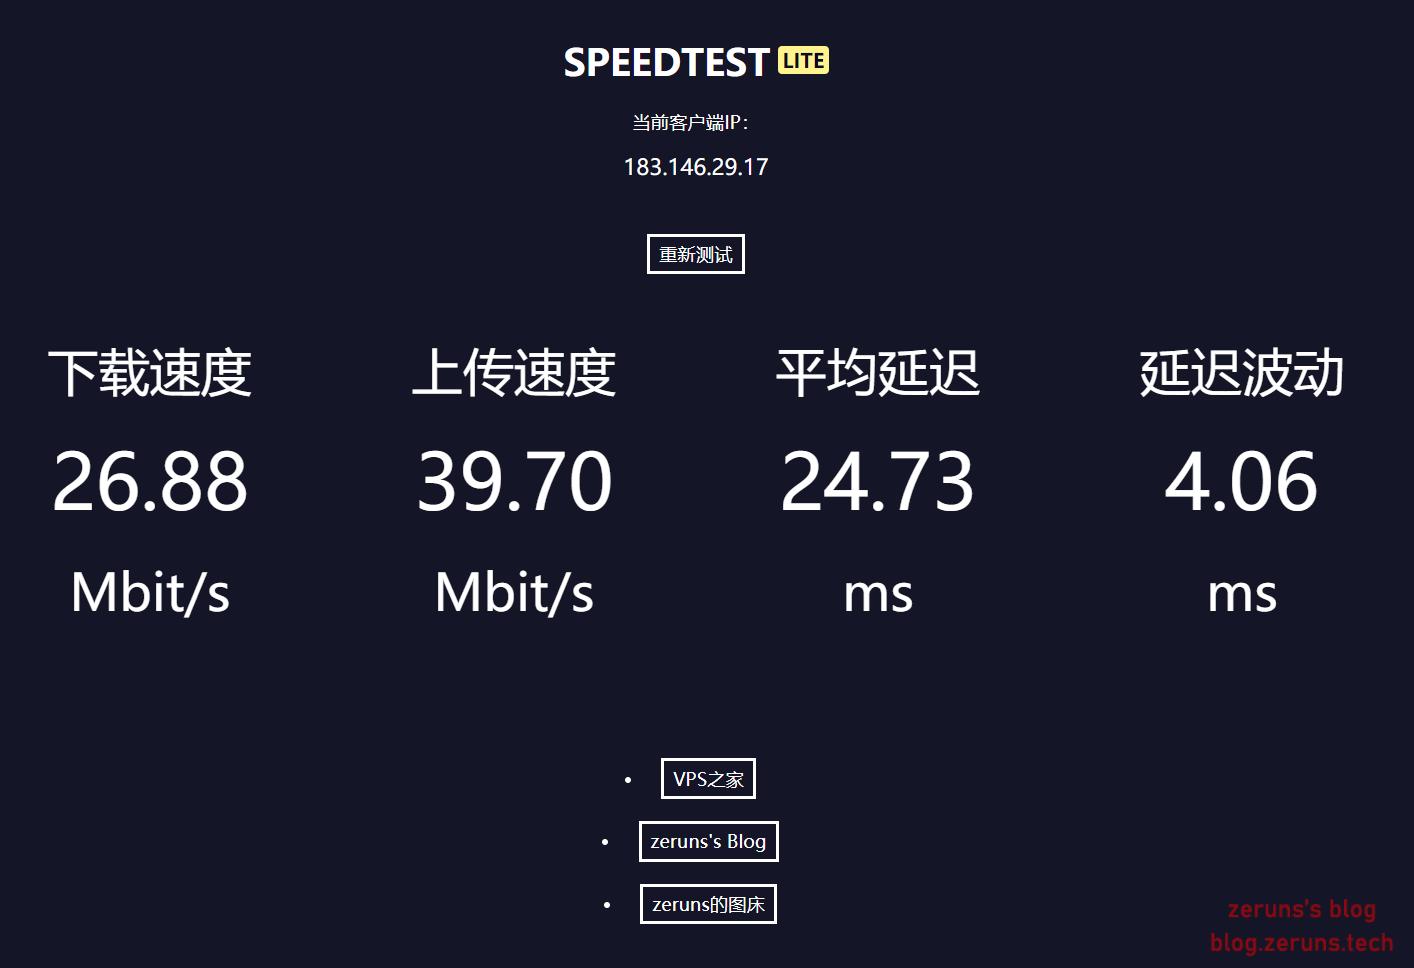 2020 07 03 21 54 44 - VPS搭建speedtest测速页面来测服务器带宽